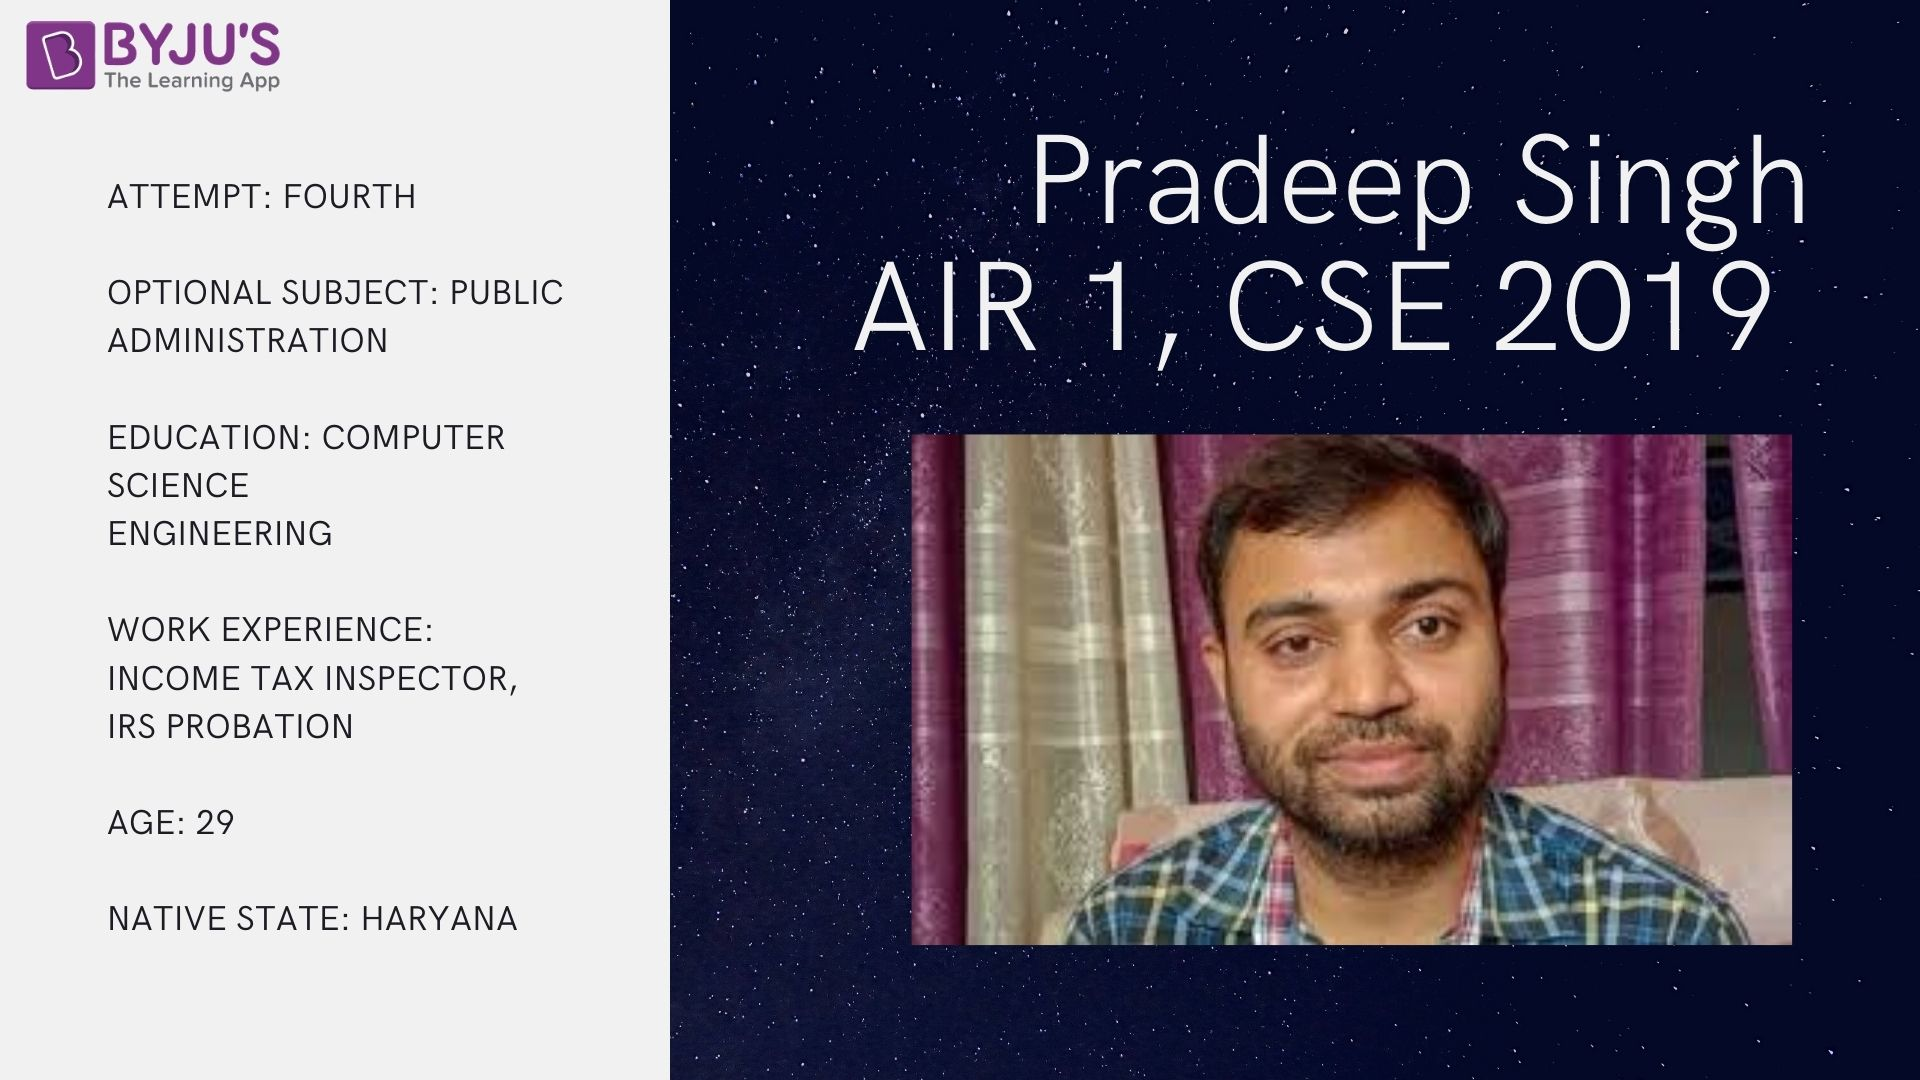 Pradeep Singh Facts